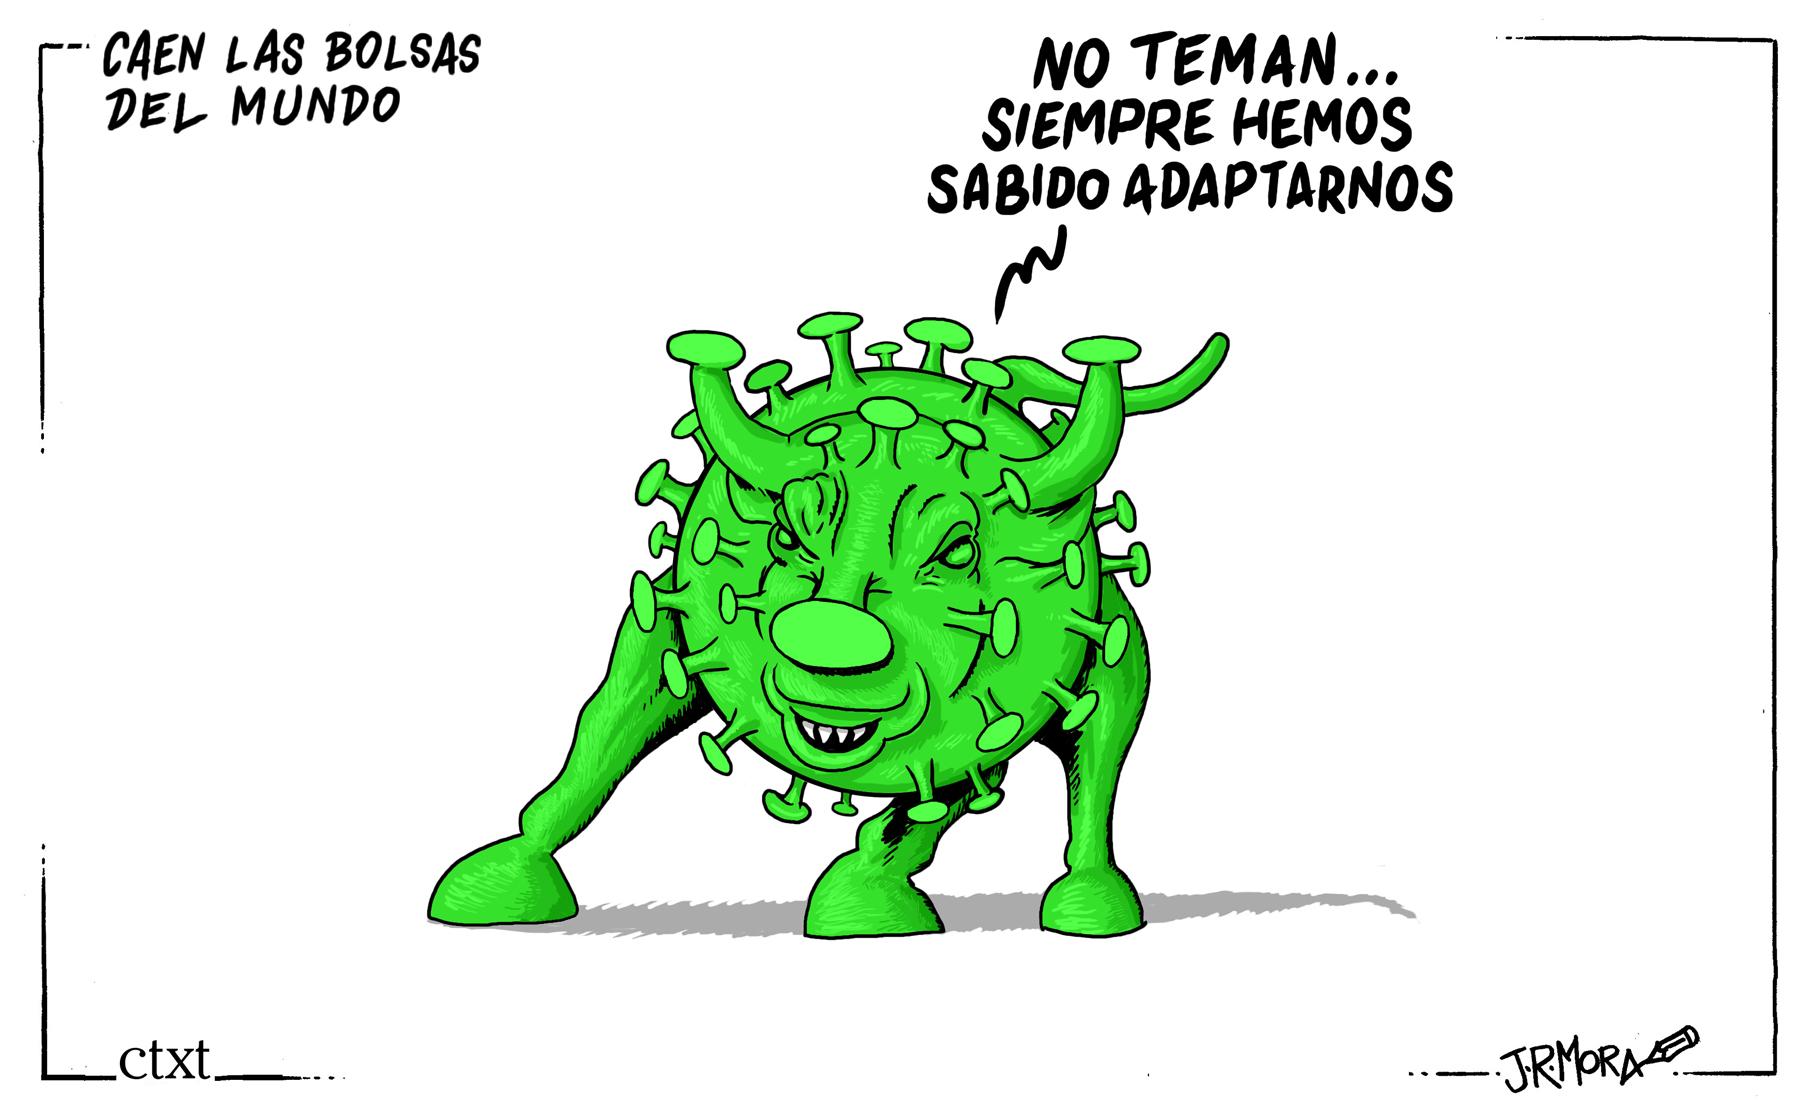 <p>Economía y coronavirus.</p>